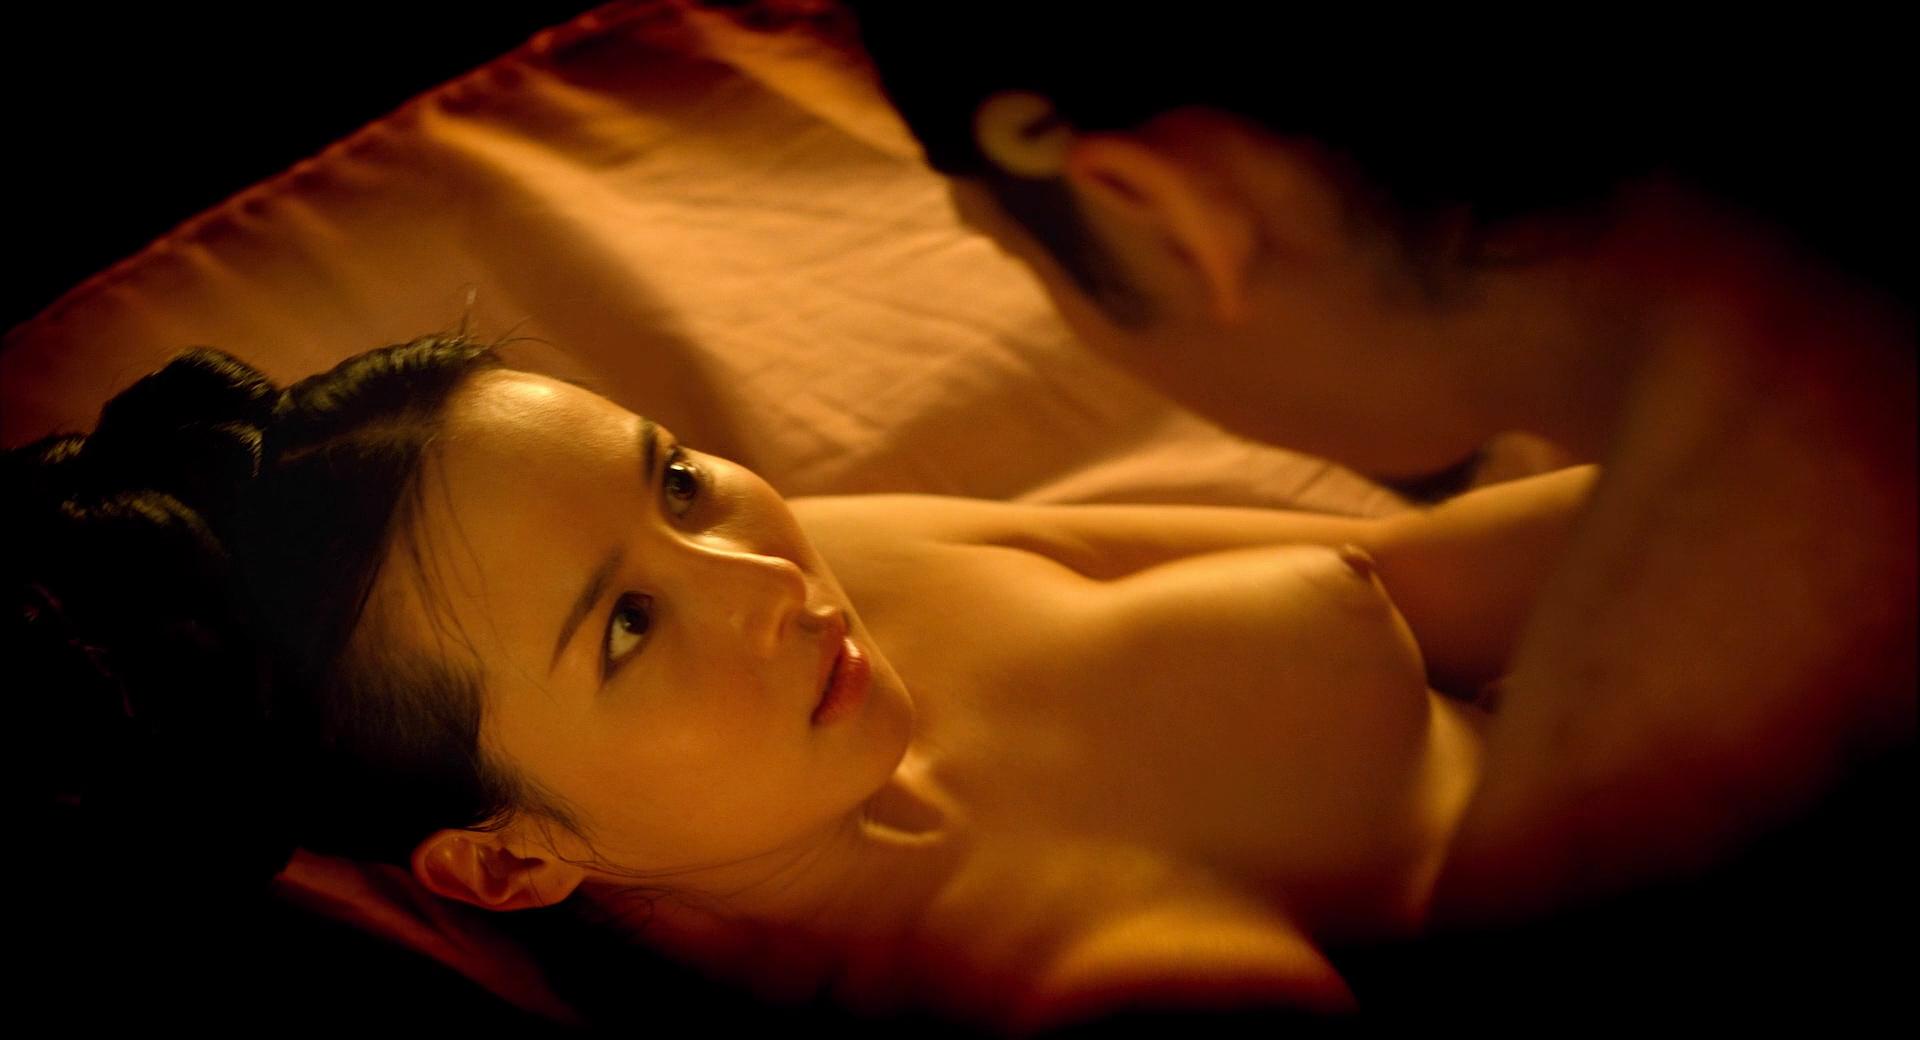 Mkv porn movies online